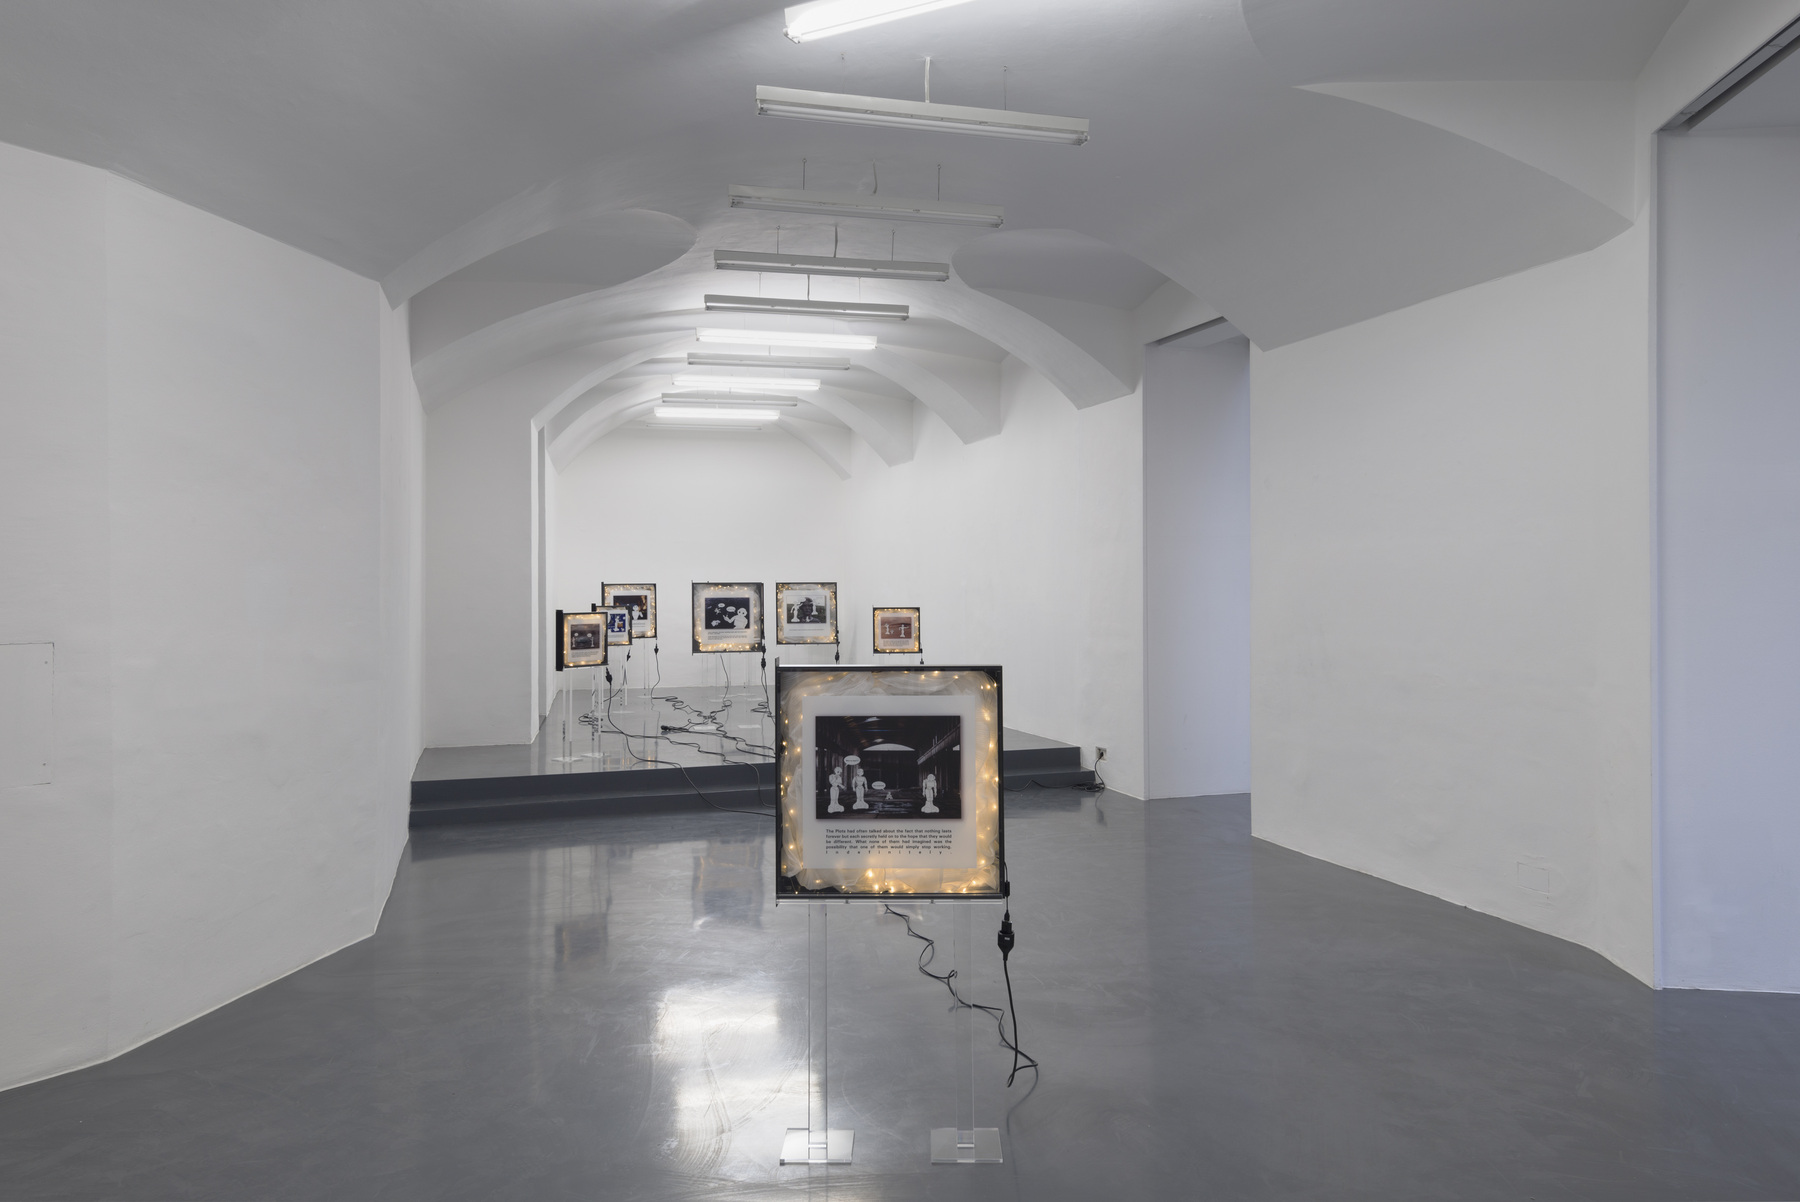 01_Cécile B. Evans_Galerie Emanuel Layr Vienna